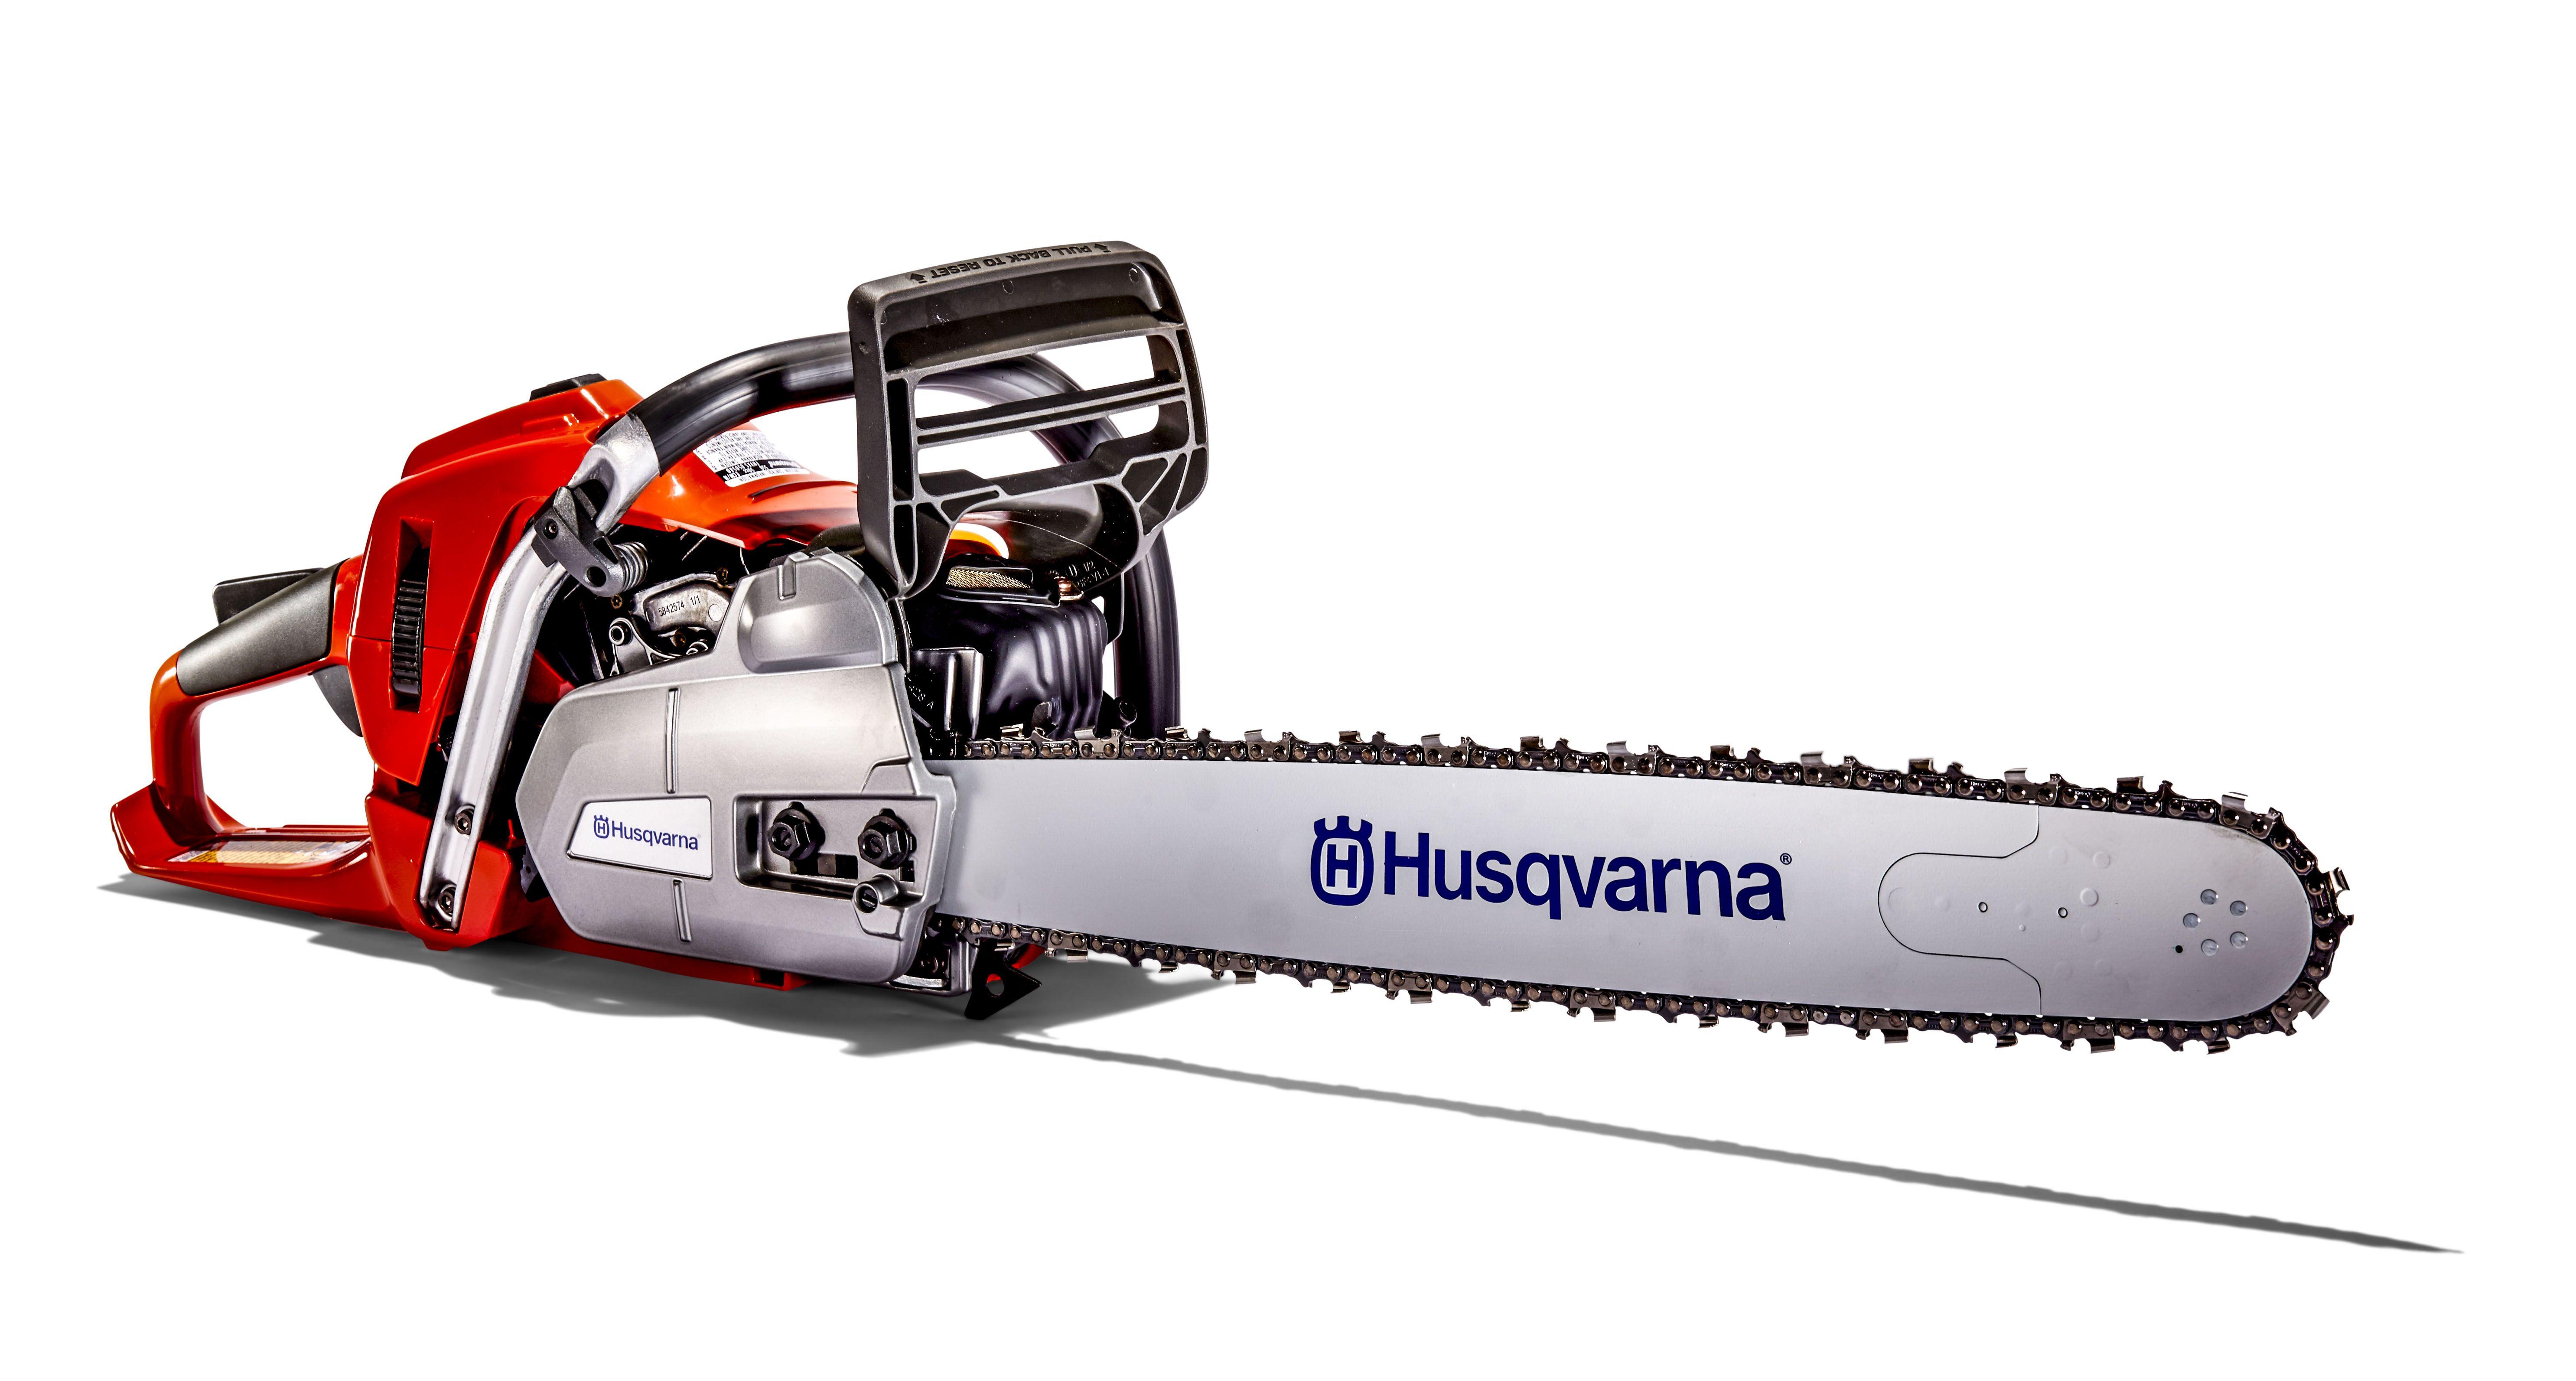 chainsaw reviews best chainsaws best gas chainsaw rh popularmechanics com Craftsman Chainsaw Manual Husqvarna Chainsaw Manual